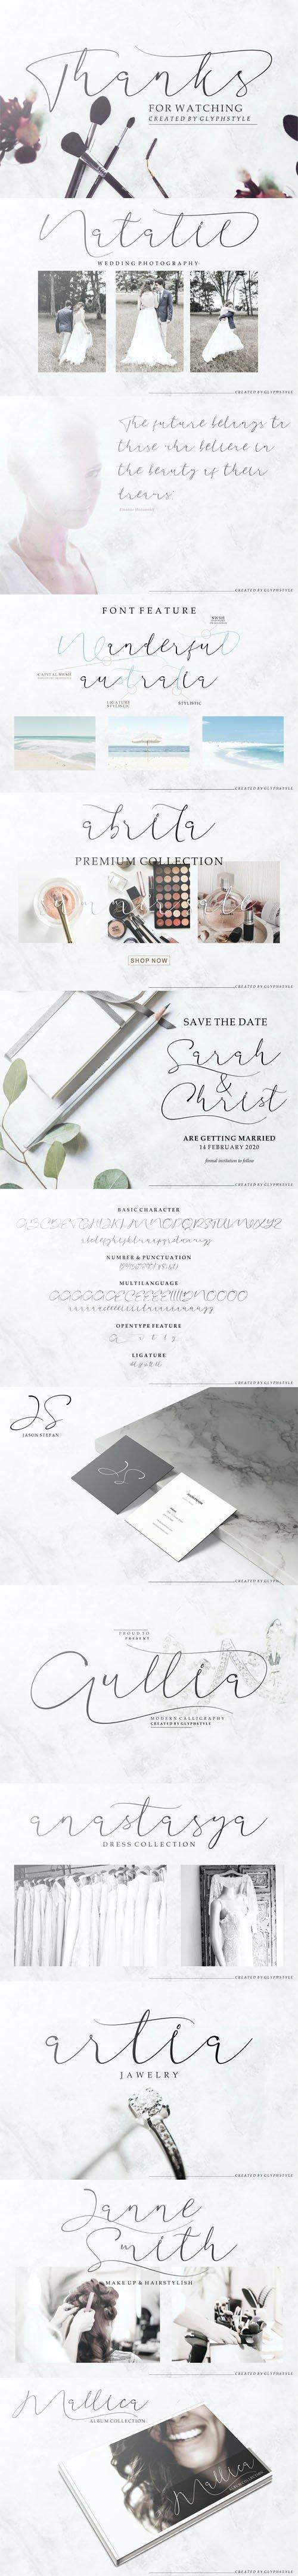 Aullia - Modern Calligraphy Font